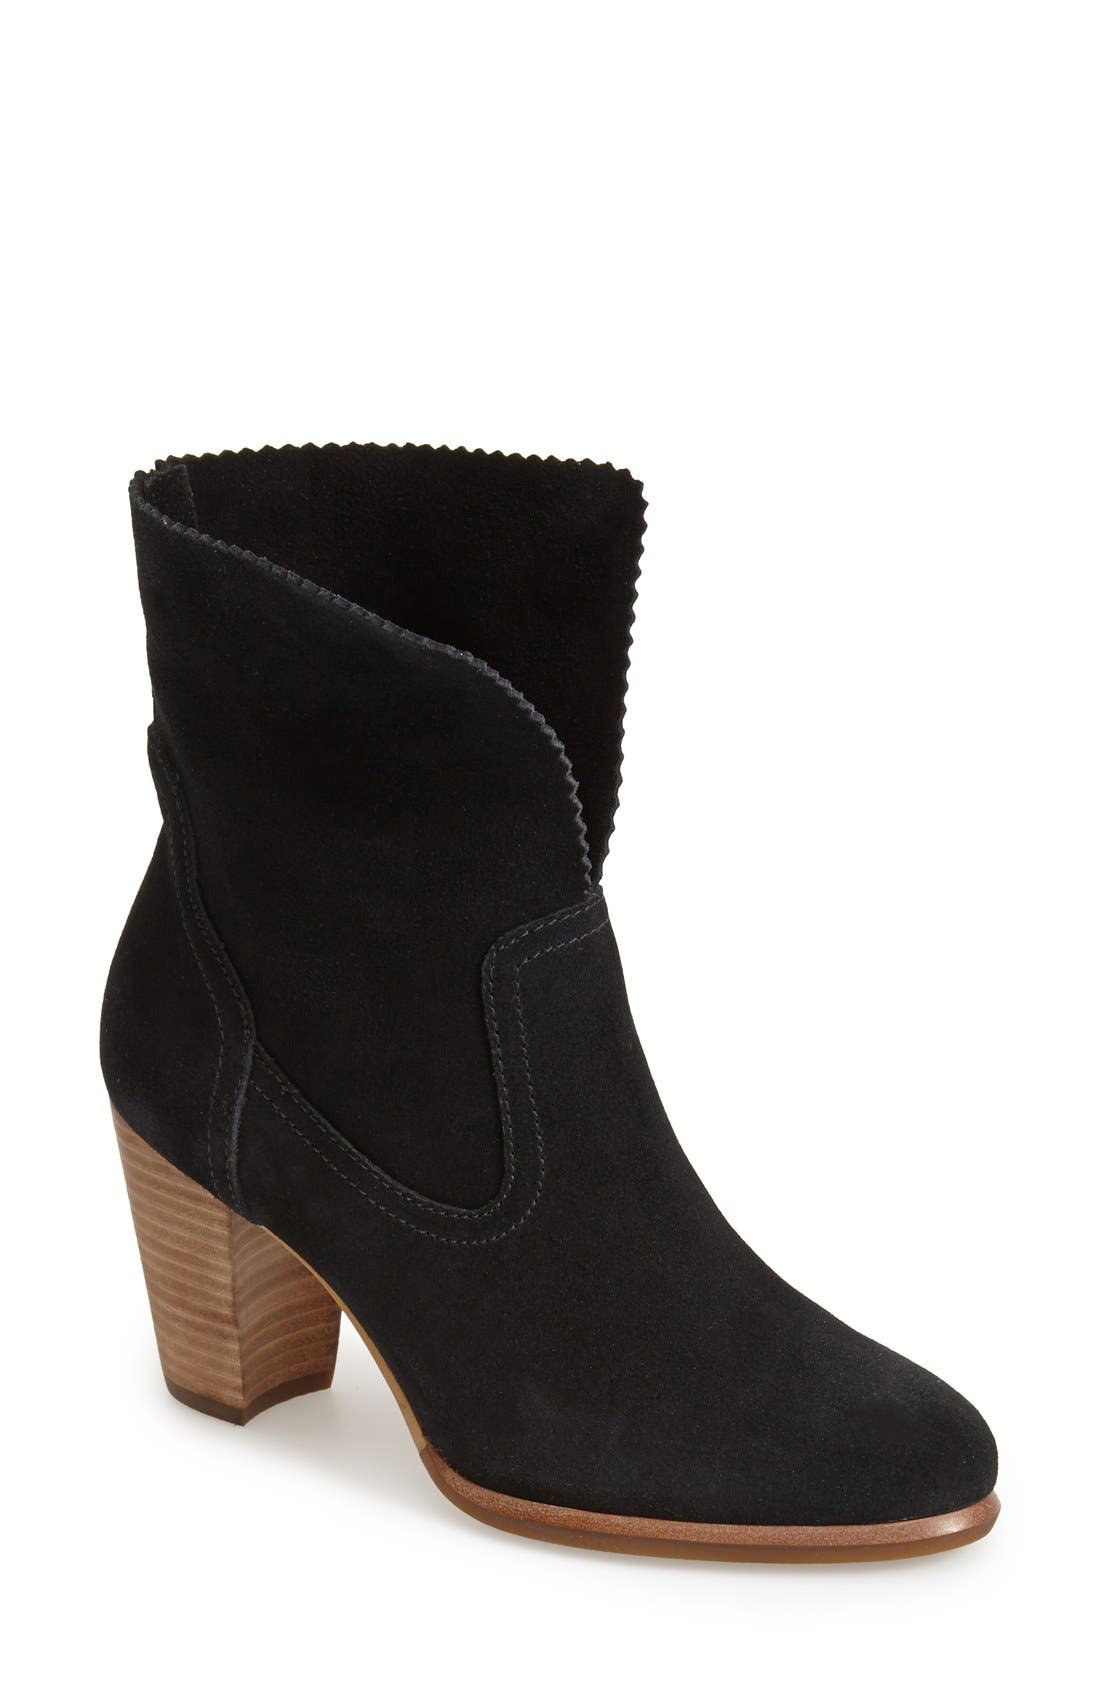 Alternate Image 1 Selected - UGG® Australia 'Thames' Foldover Cuff Boot (Women)